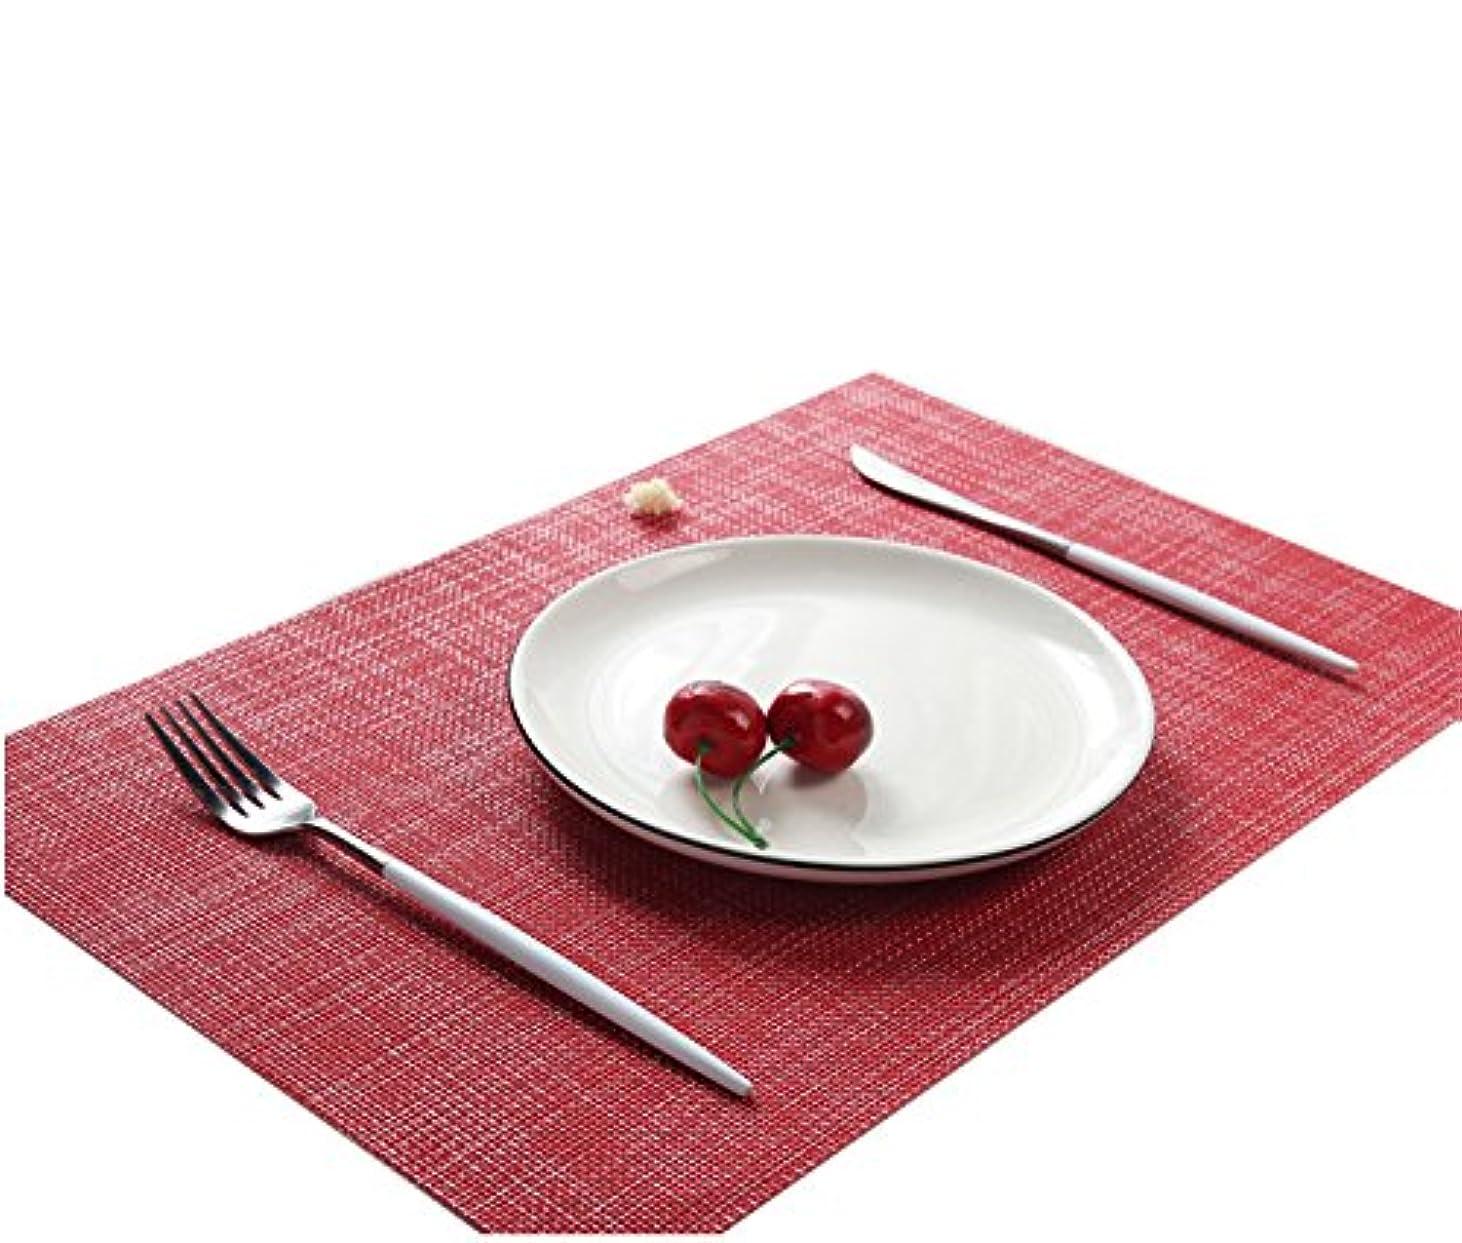 Mengshen ランチョンマット テーブルマット 北欧風 撥水 防汚 滑り止め 摩擦耐える 断熱 華やか雰囲気 PVC製 4枚セット CJ26 Red